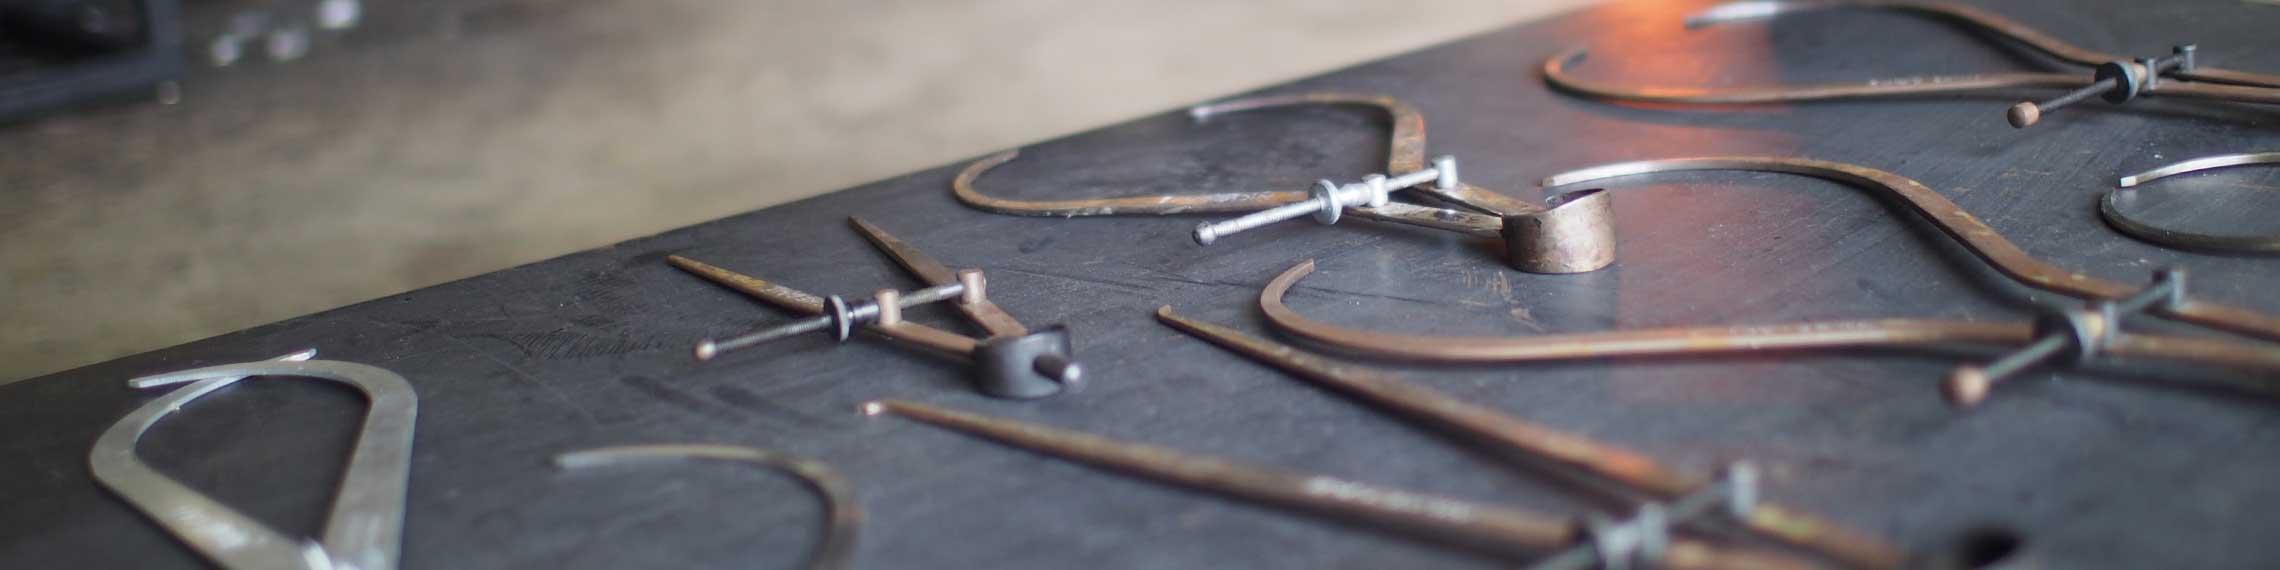 glassblowing tools for handmade modern lighting